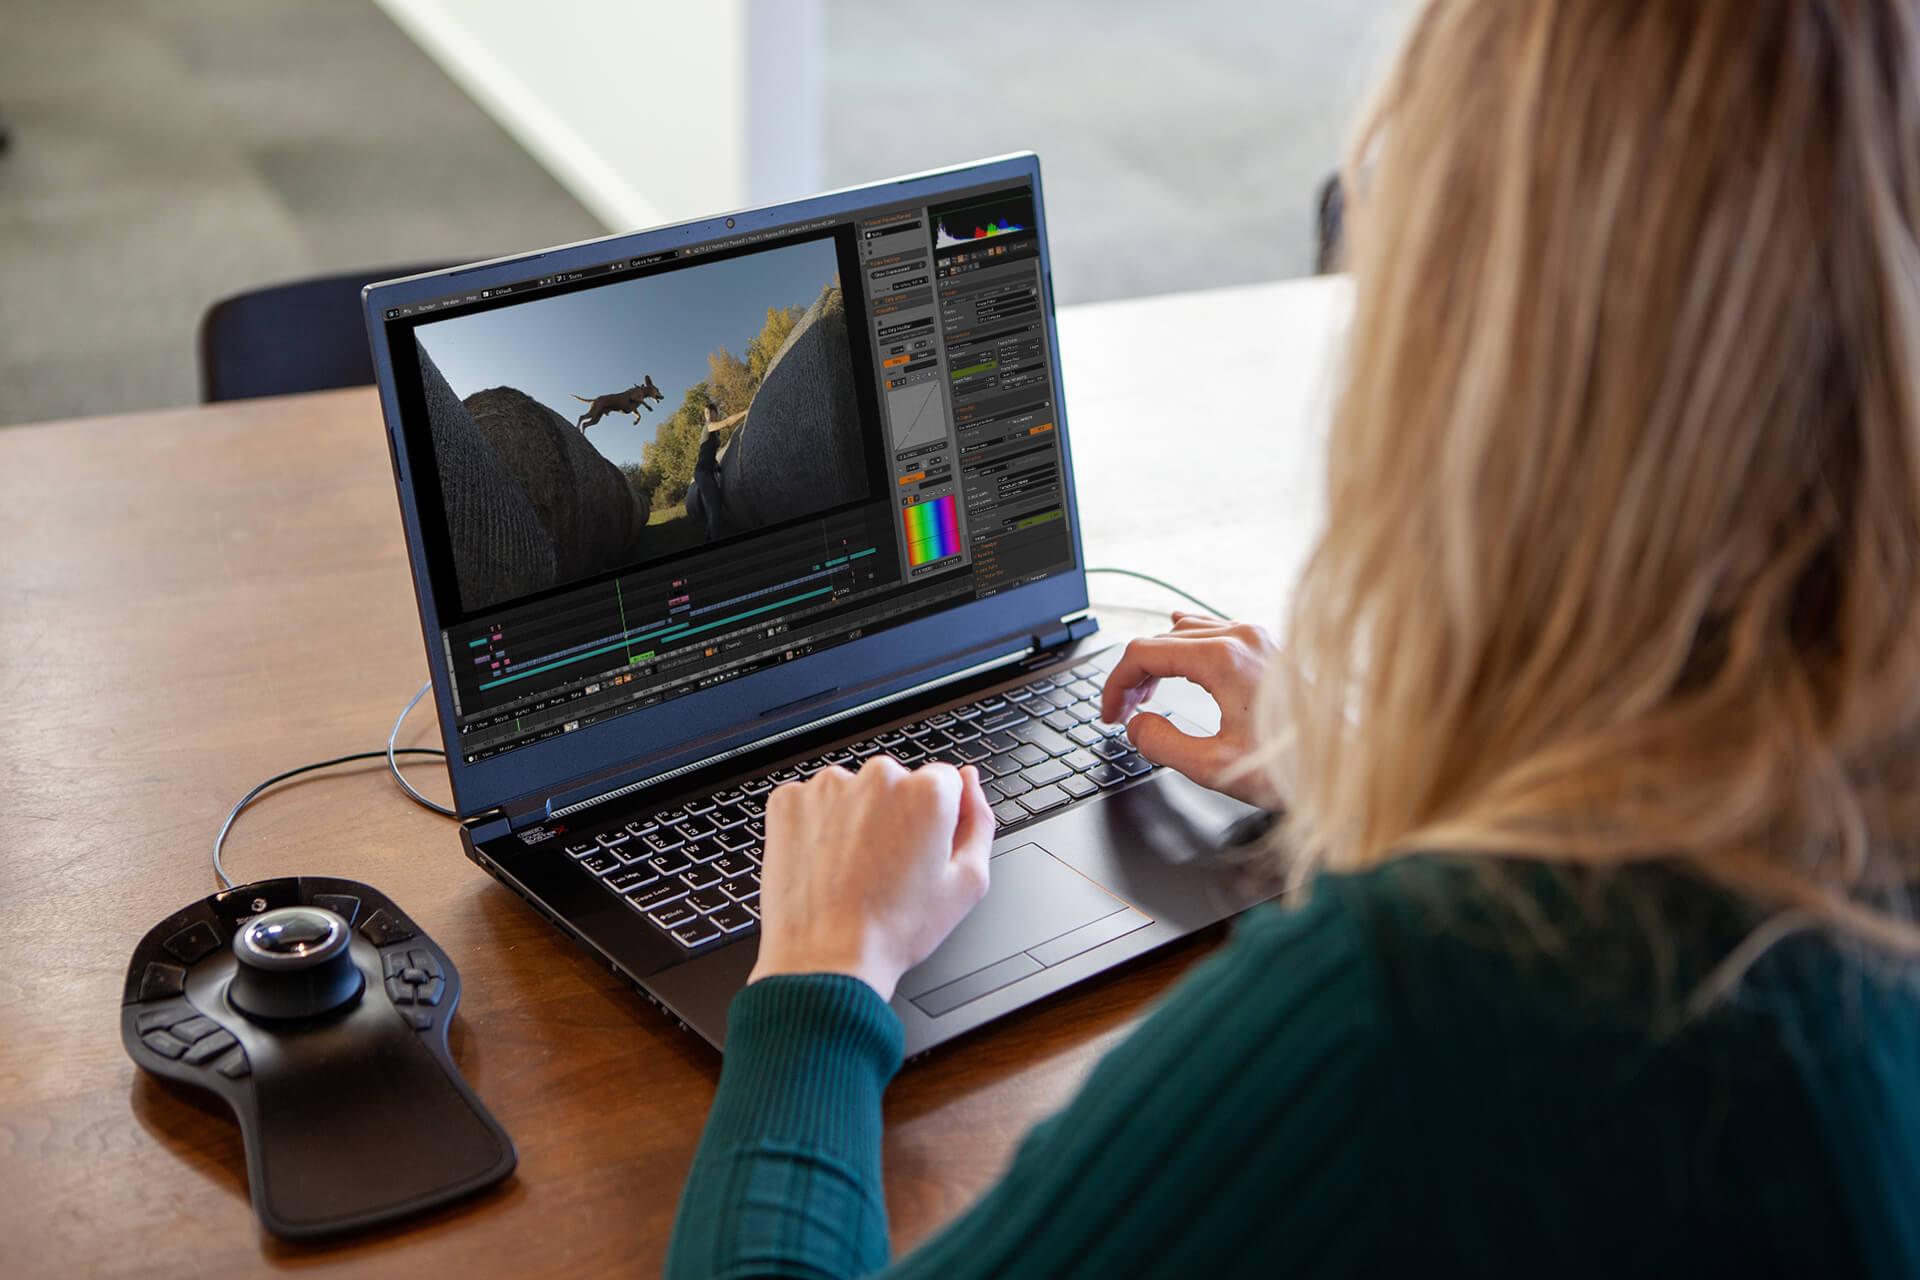 Clevo PC70DP PC70DR PC70DC Laptop